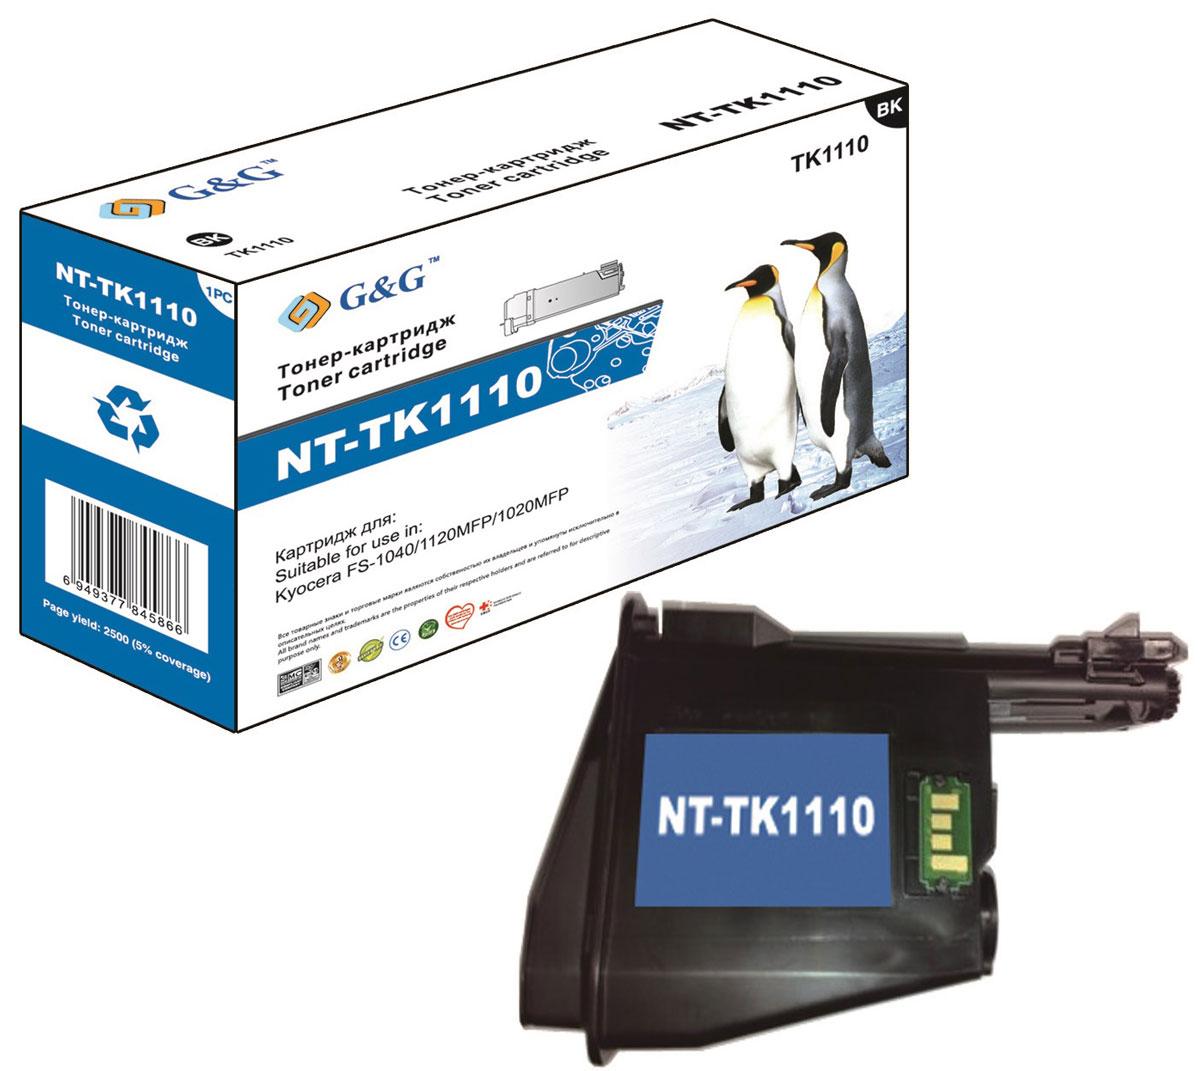 G&G NT-TK1110 тонер-картридж для Kyocera FS-1040/1020MFP/1120MFP